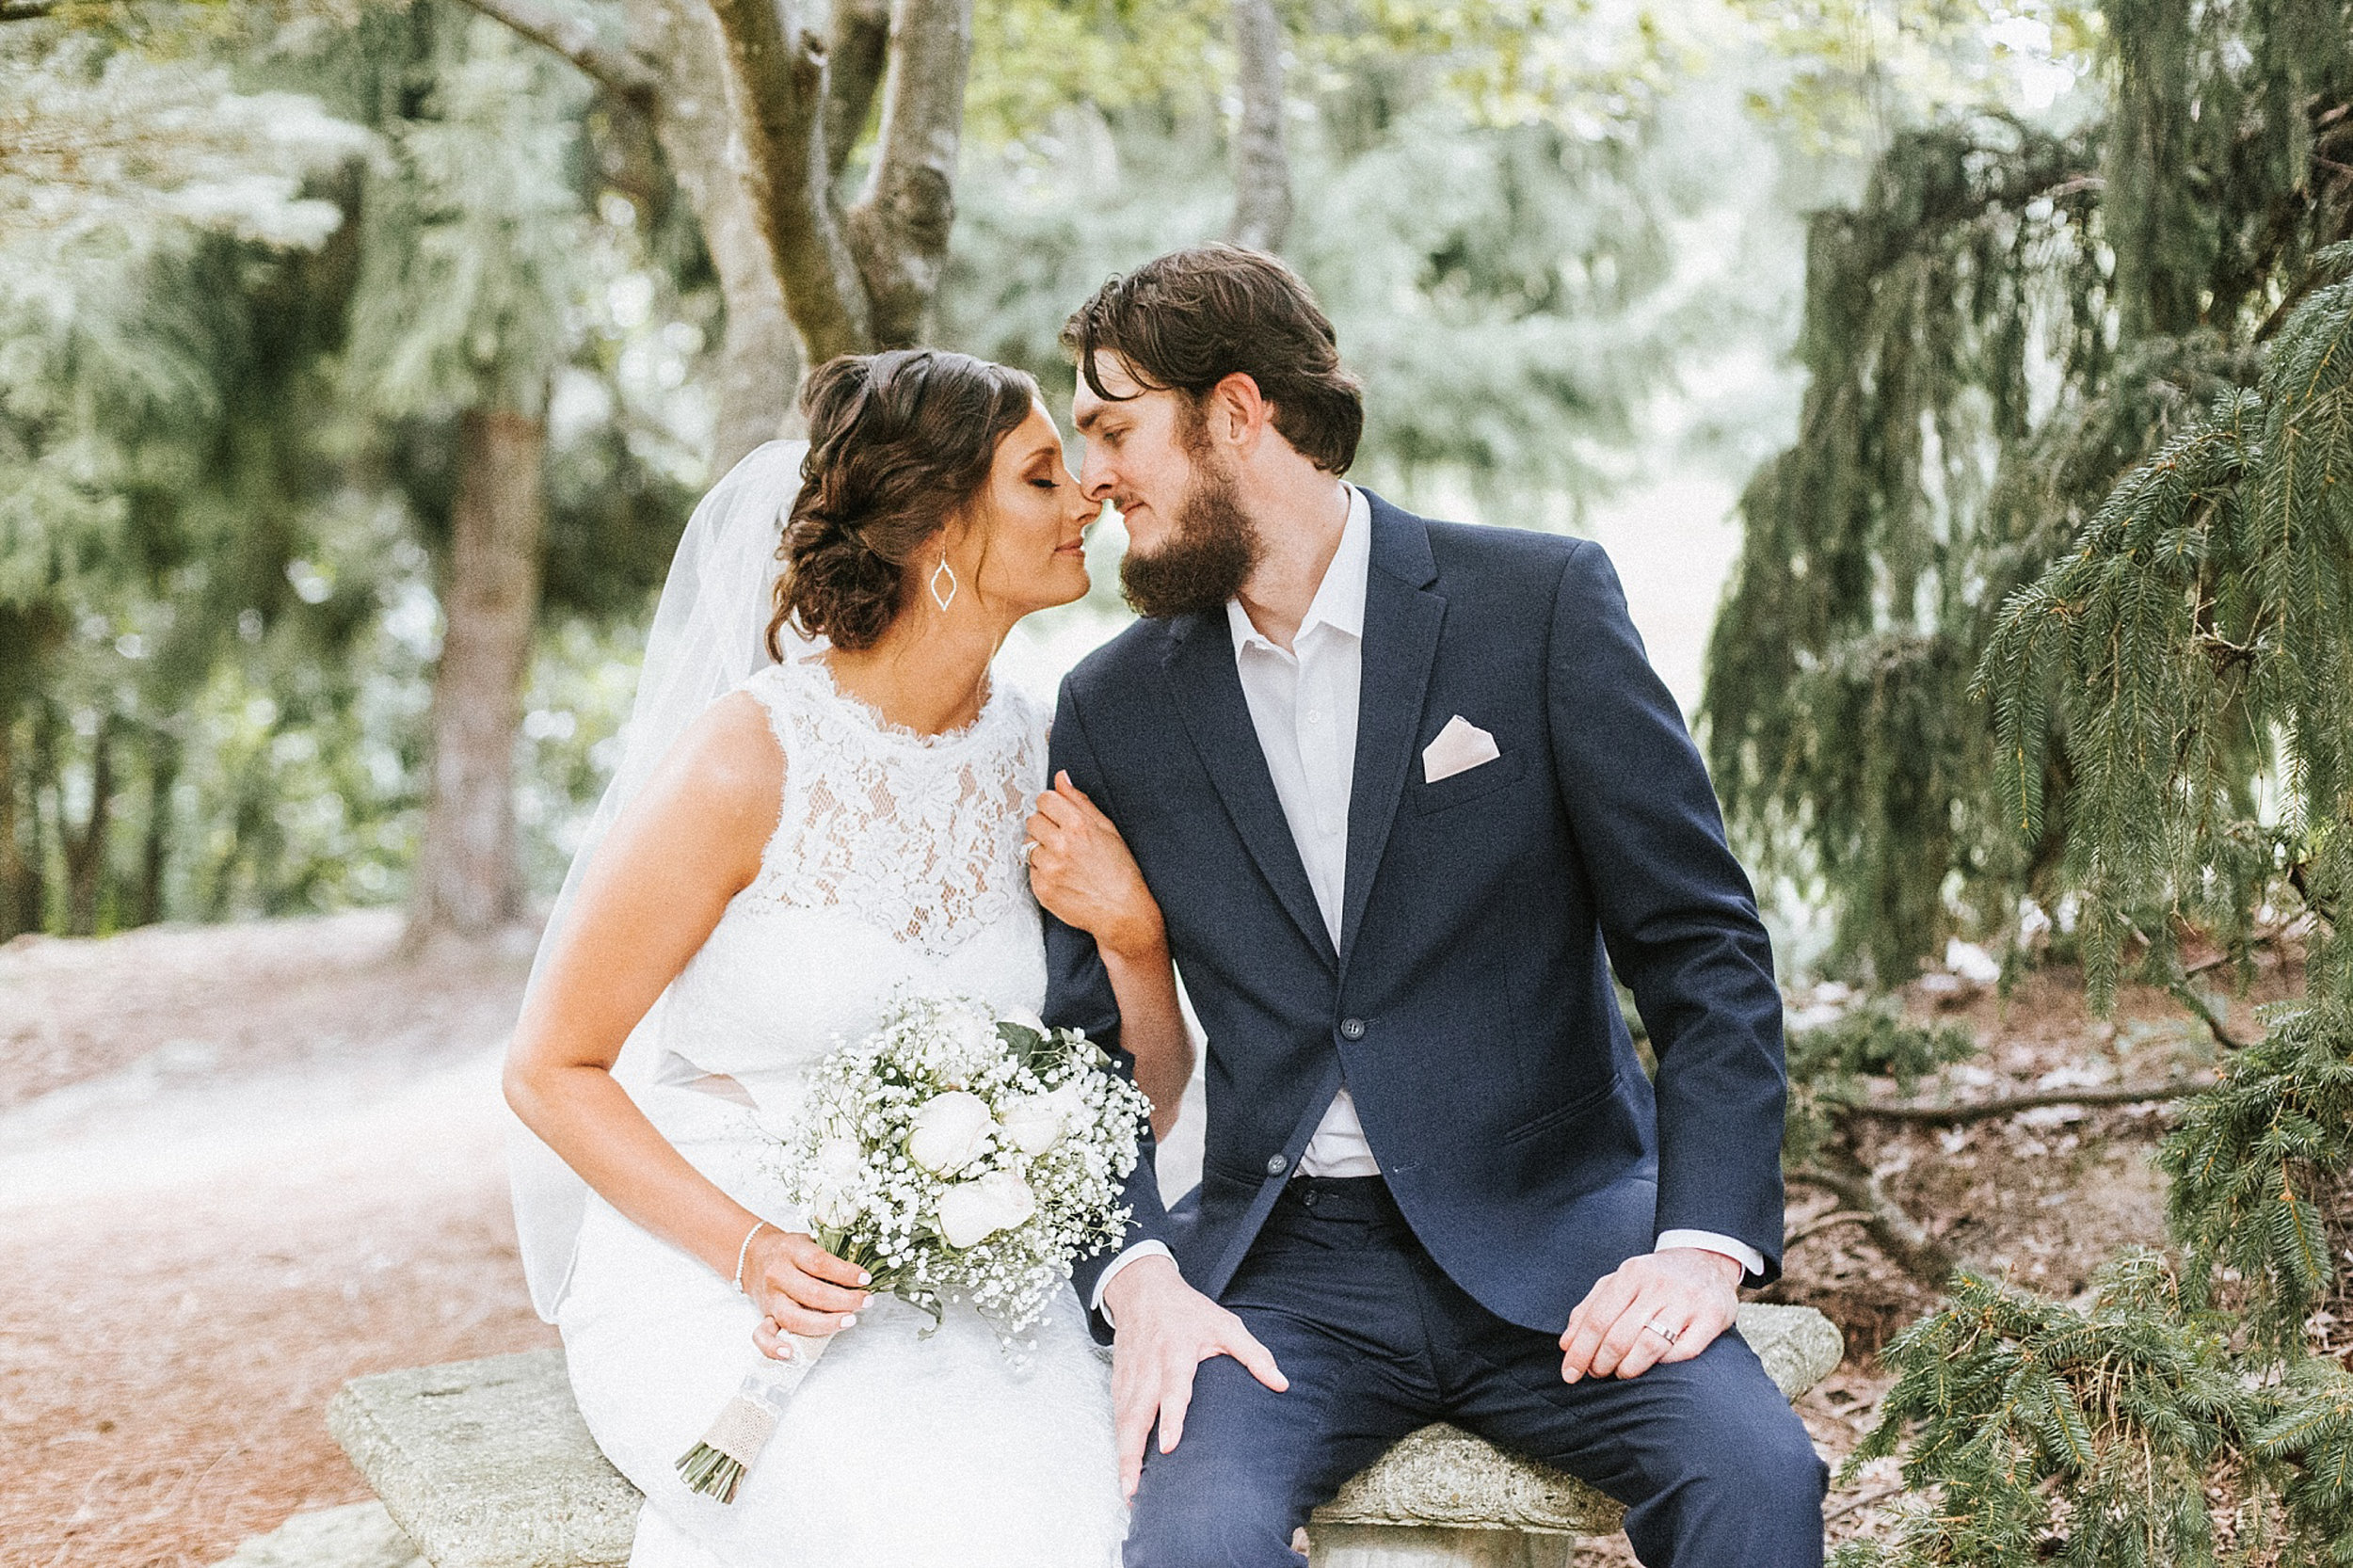 Brooke Townsend Photography - Ohio Wedding Photographer (33 of 78).jpg